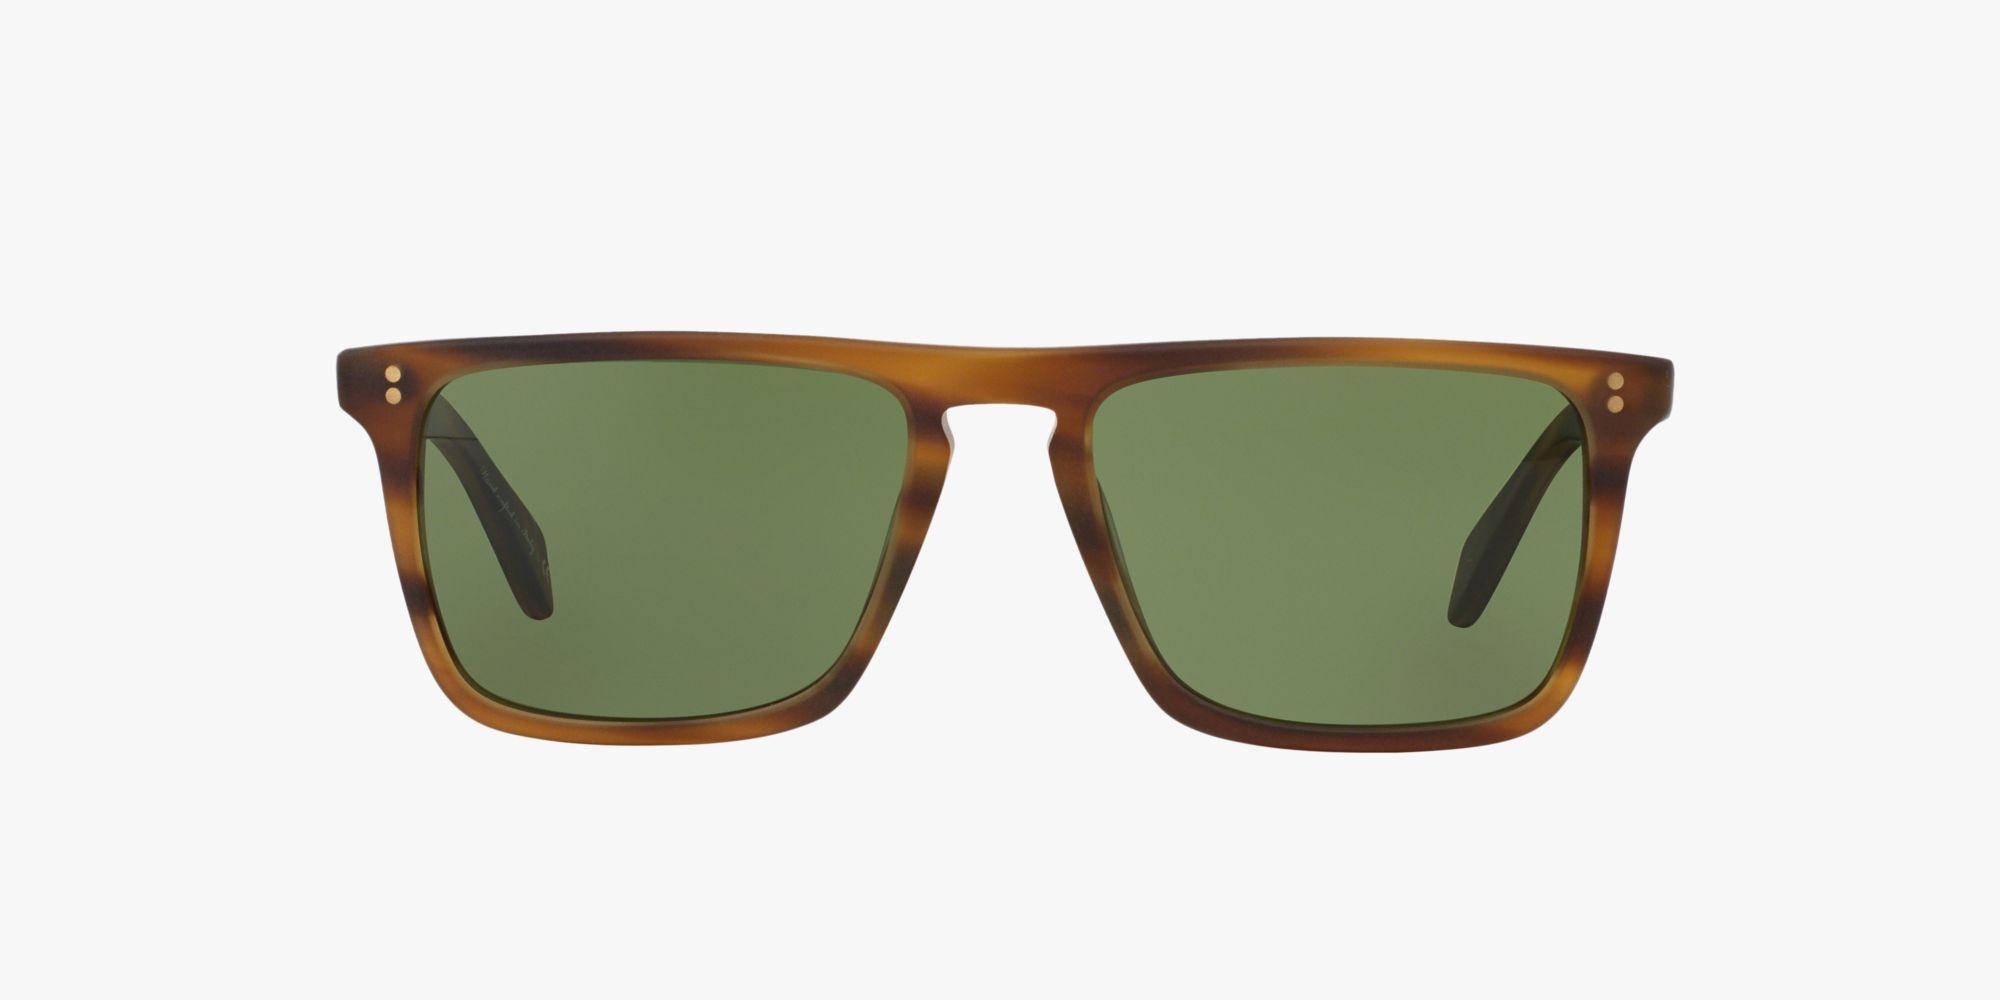 2607d01d5b Sun OV5189S - Matte Sandalwood - Green C - Acetate